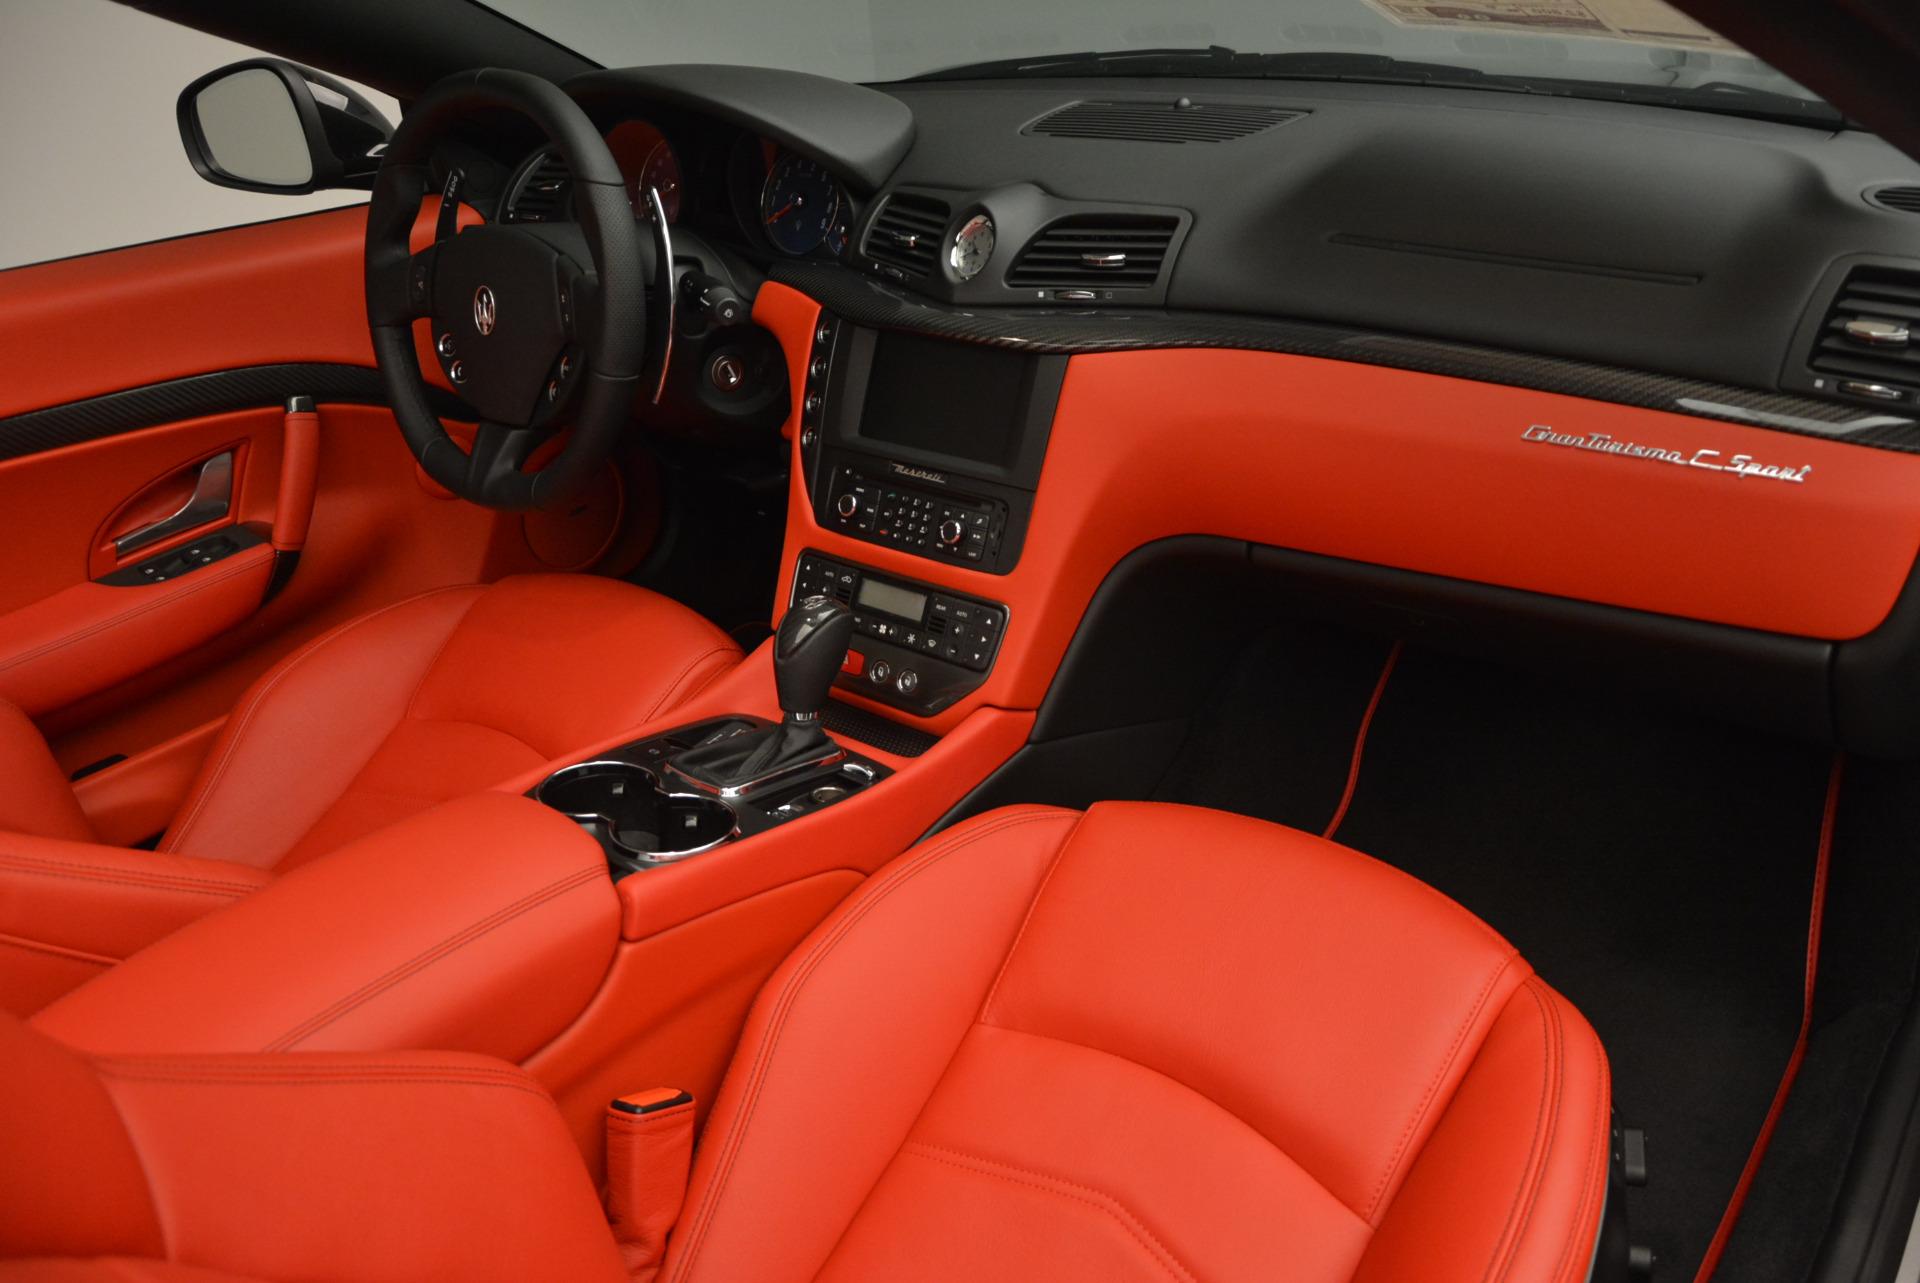 New-2017-Maserati-GranTurismo-Cab-Sport